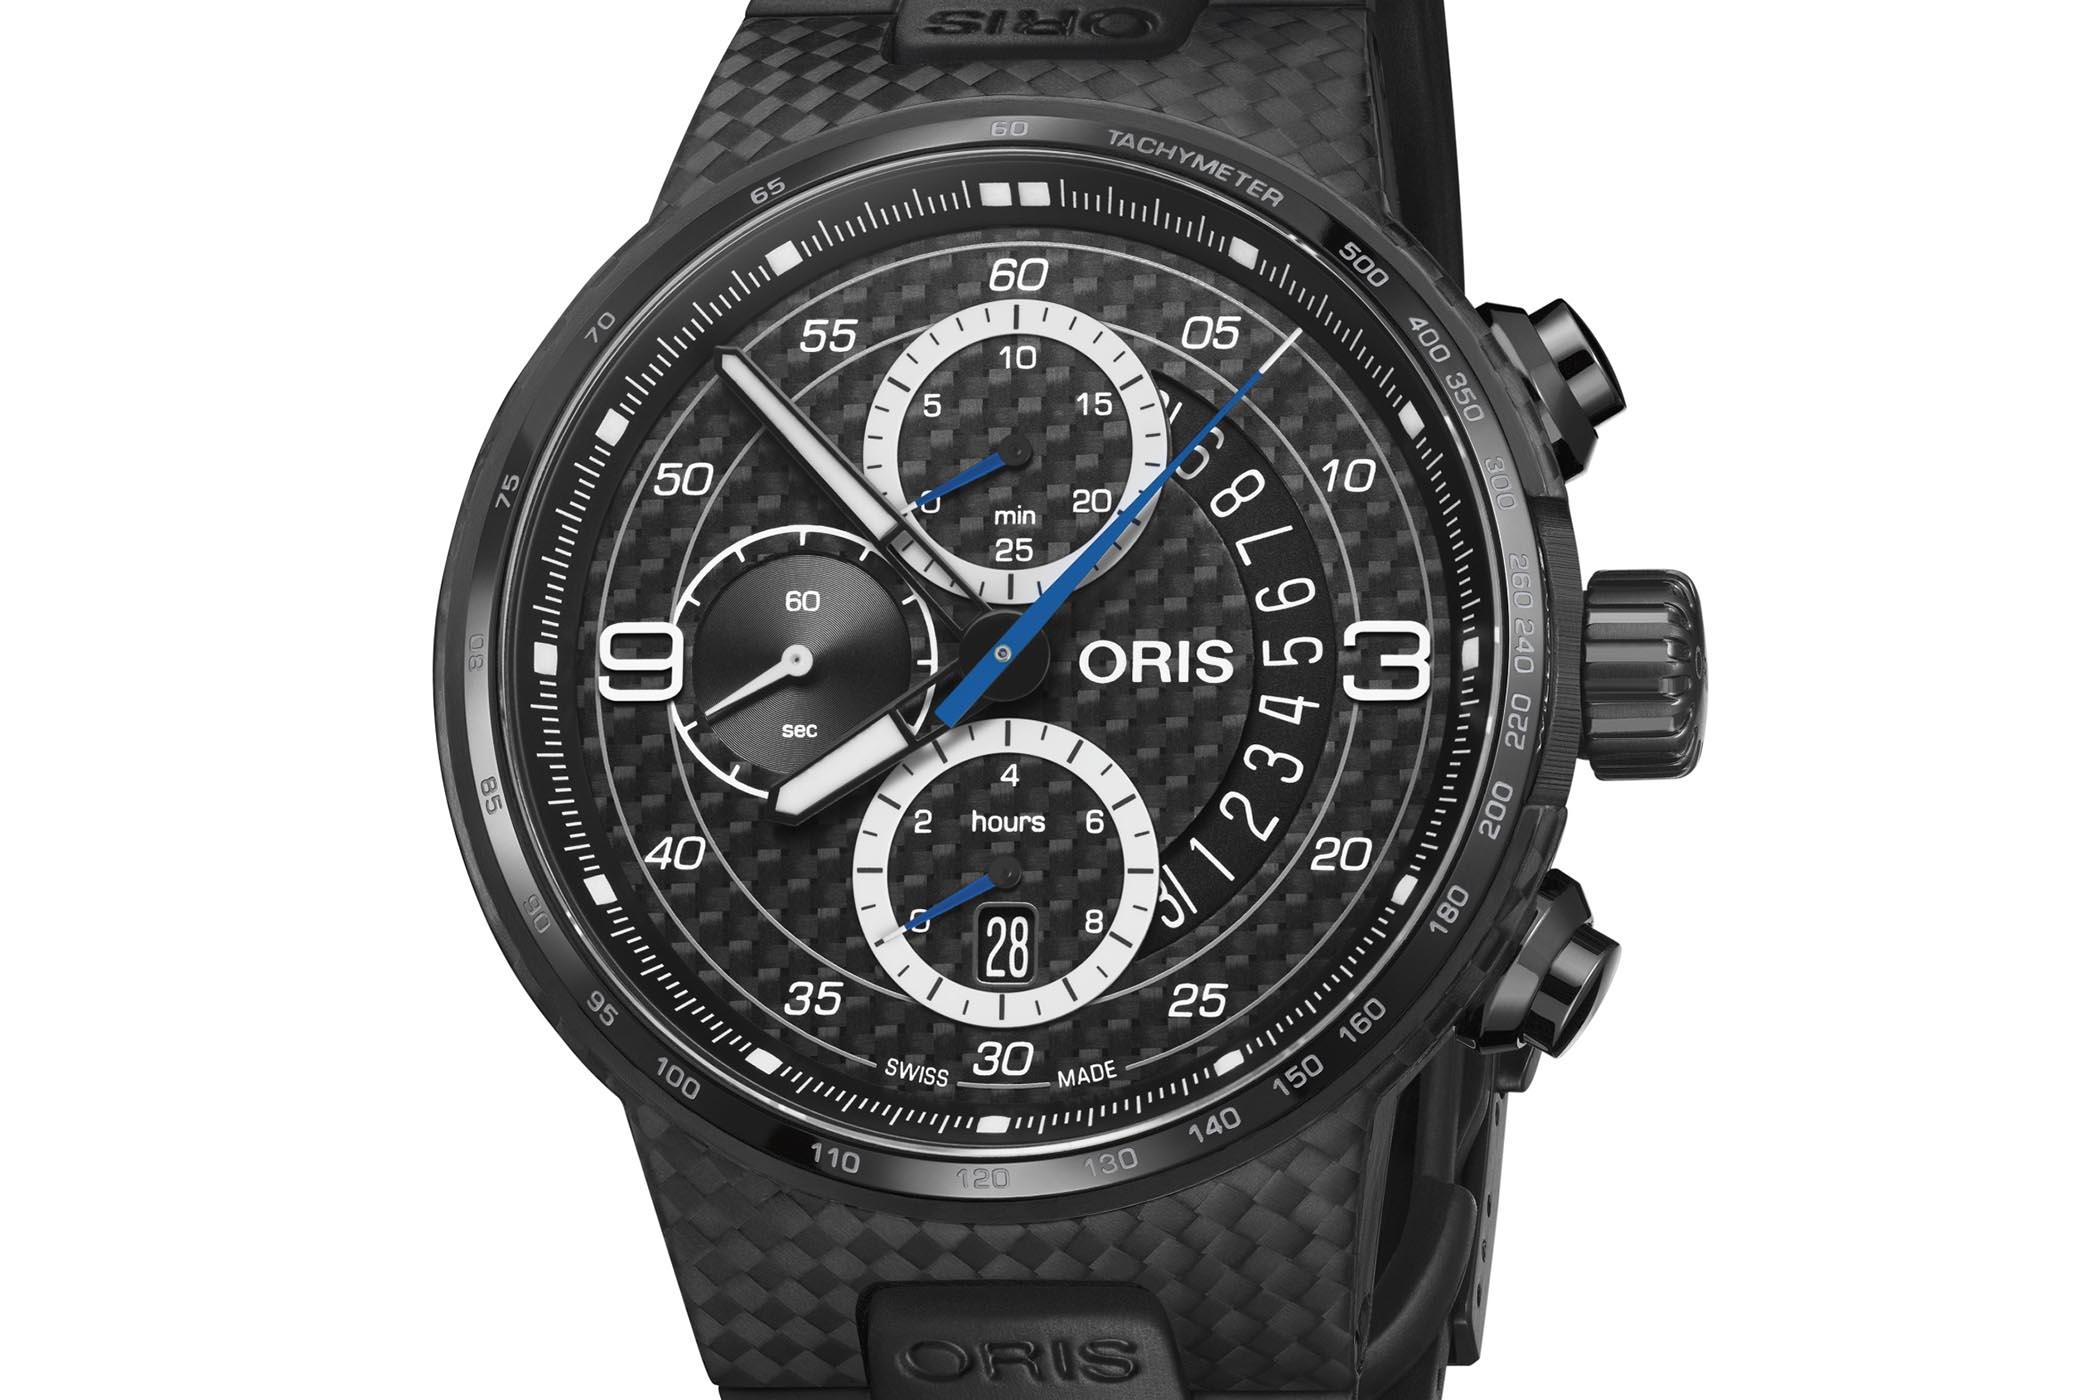 Oris Williams FW41 Limited Edition Full Carbon